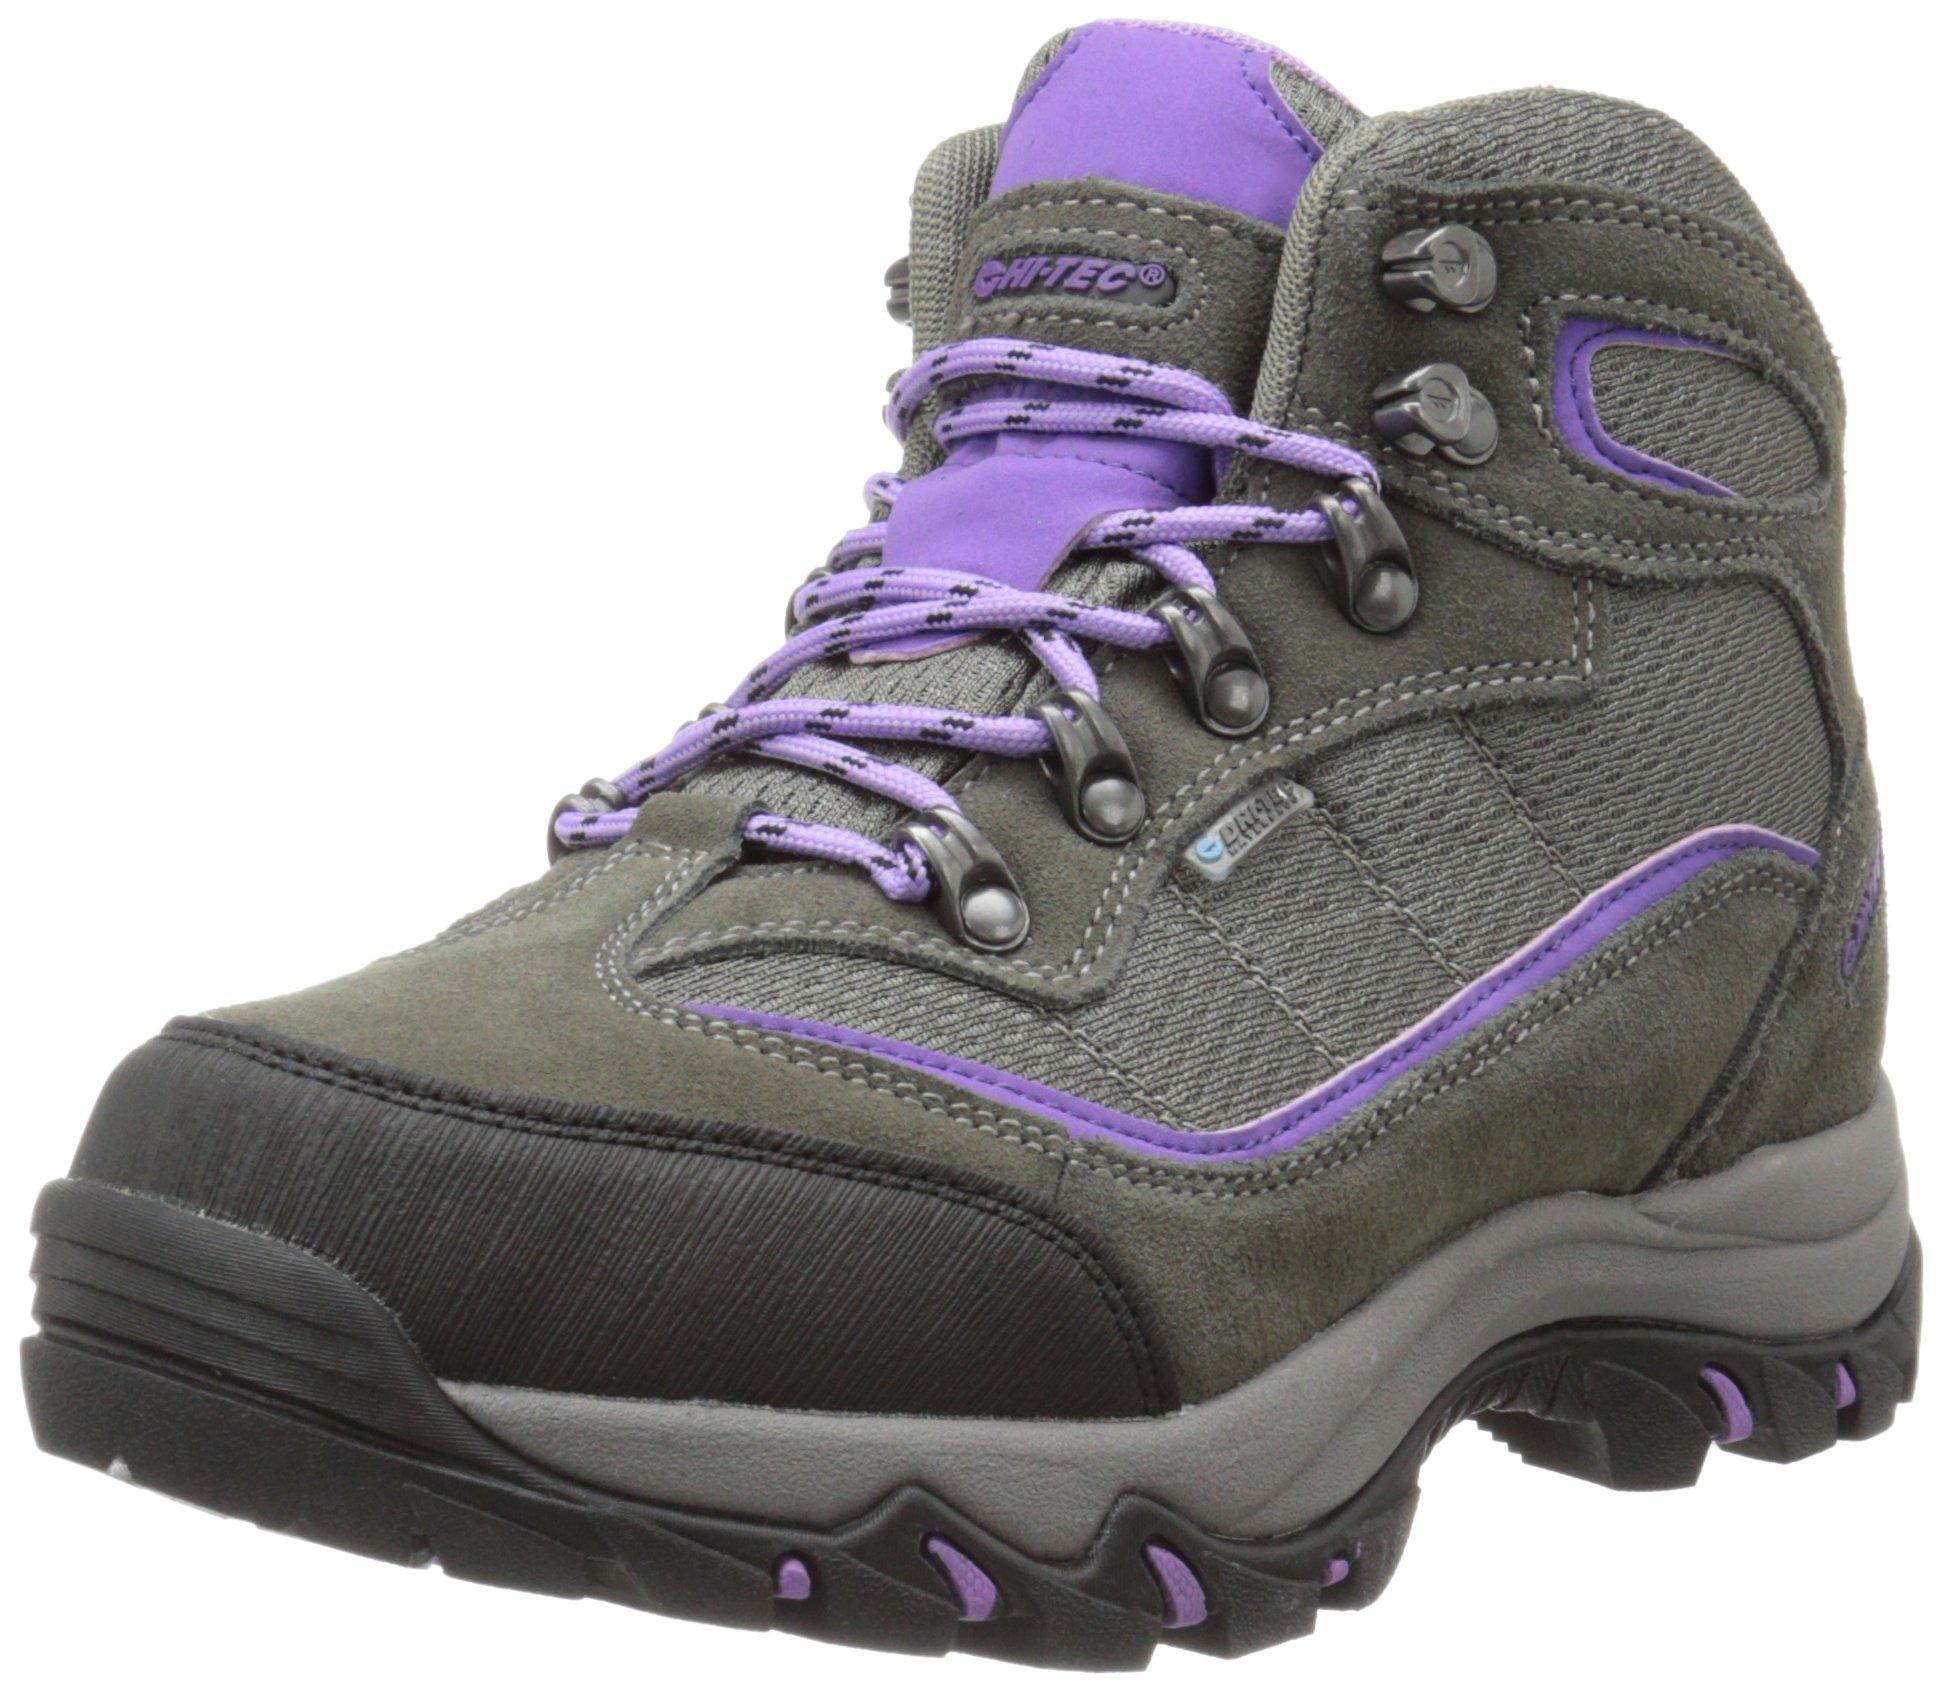 Hi-Tec Women's Skamania Waterproof-W Hiking Boot, Grey/Viola, 9 W US by Hi-Tec